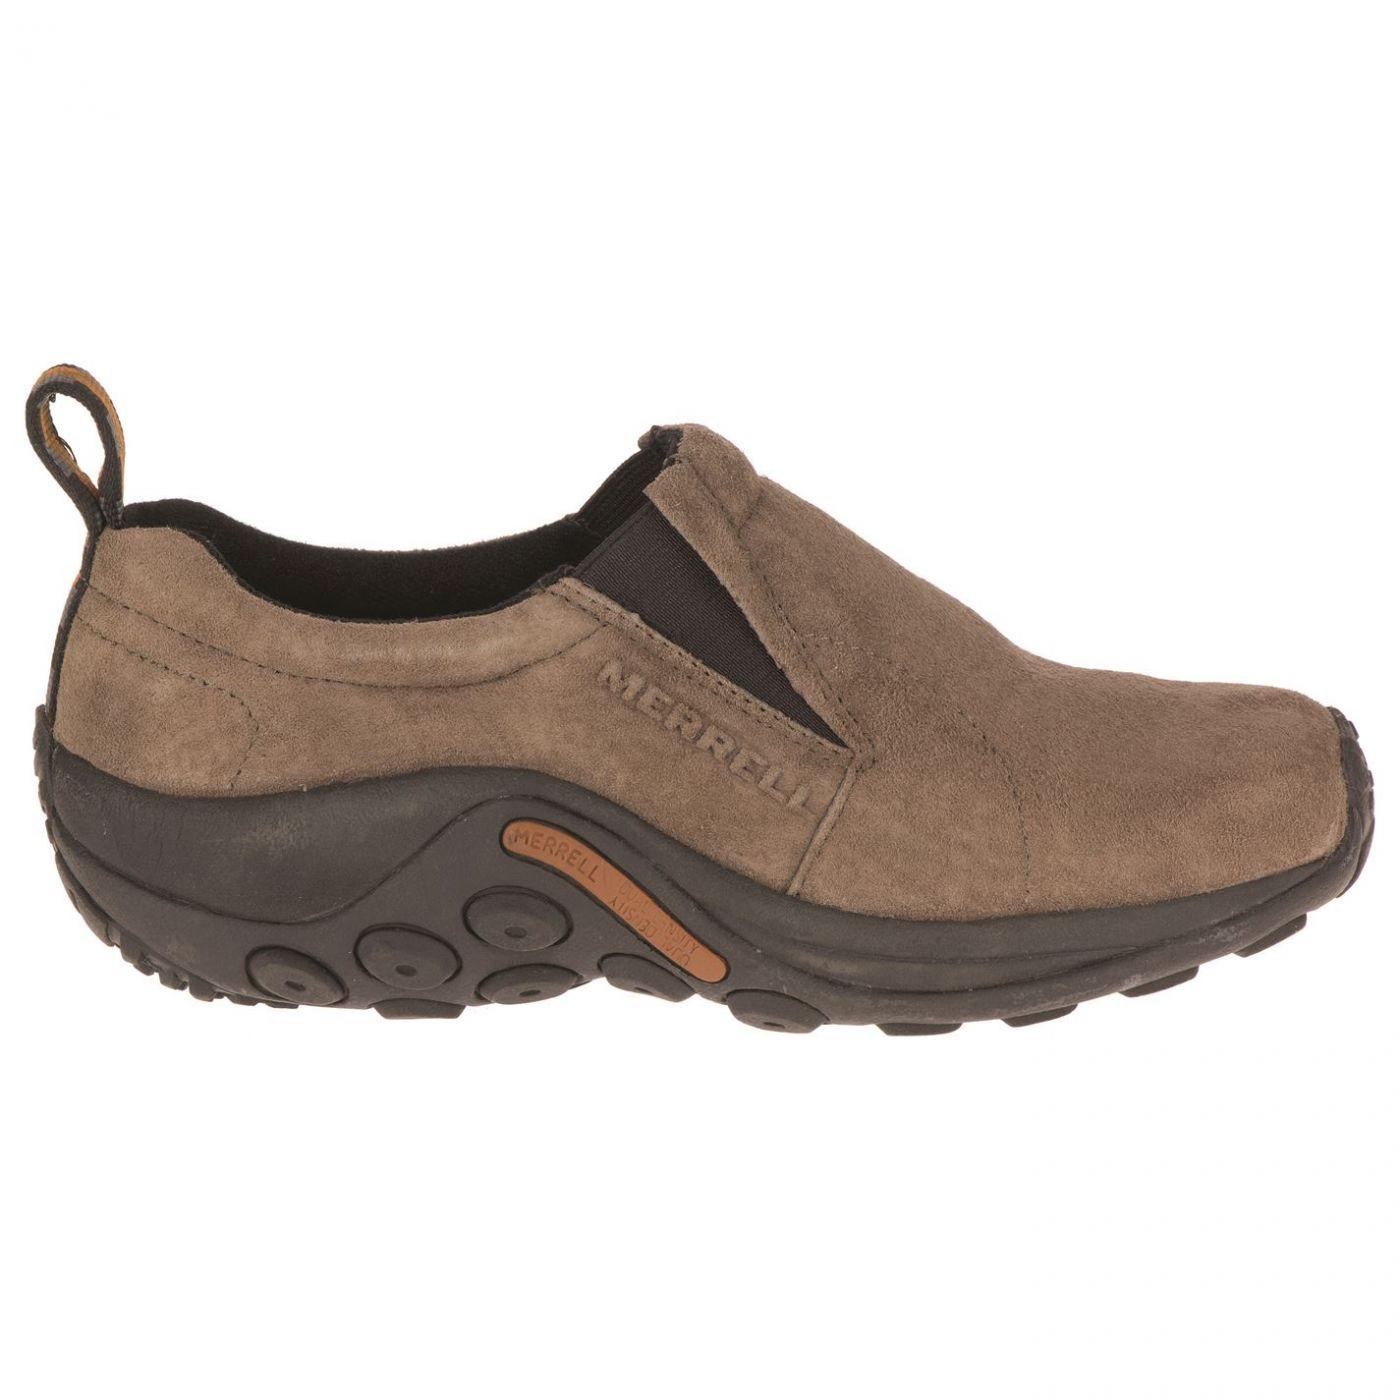 Merrell Jungle Moc Ladies Walking Shoes